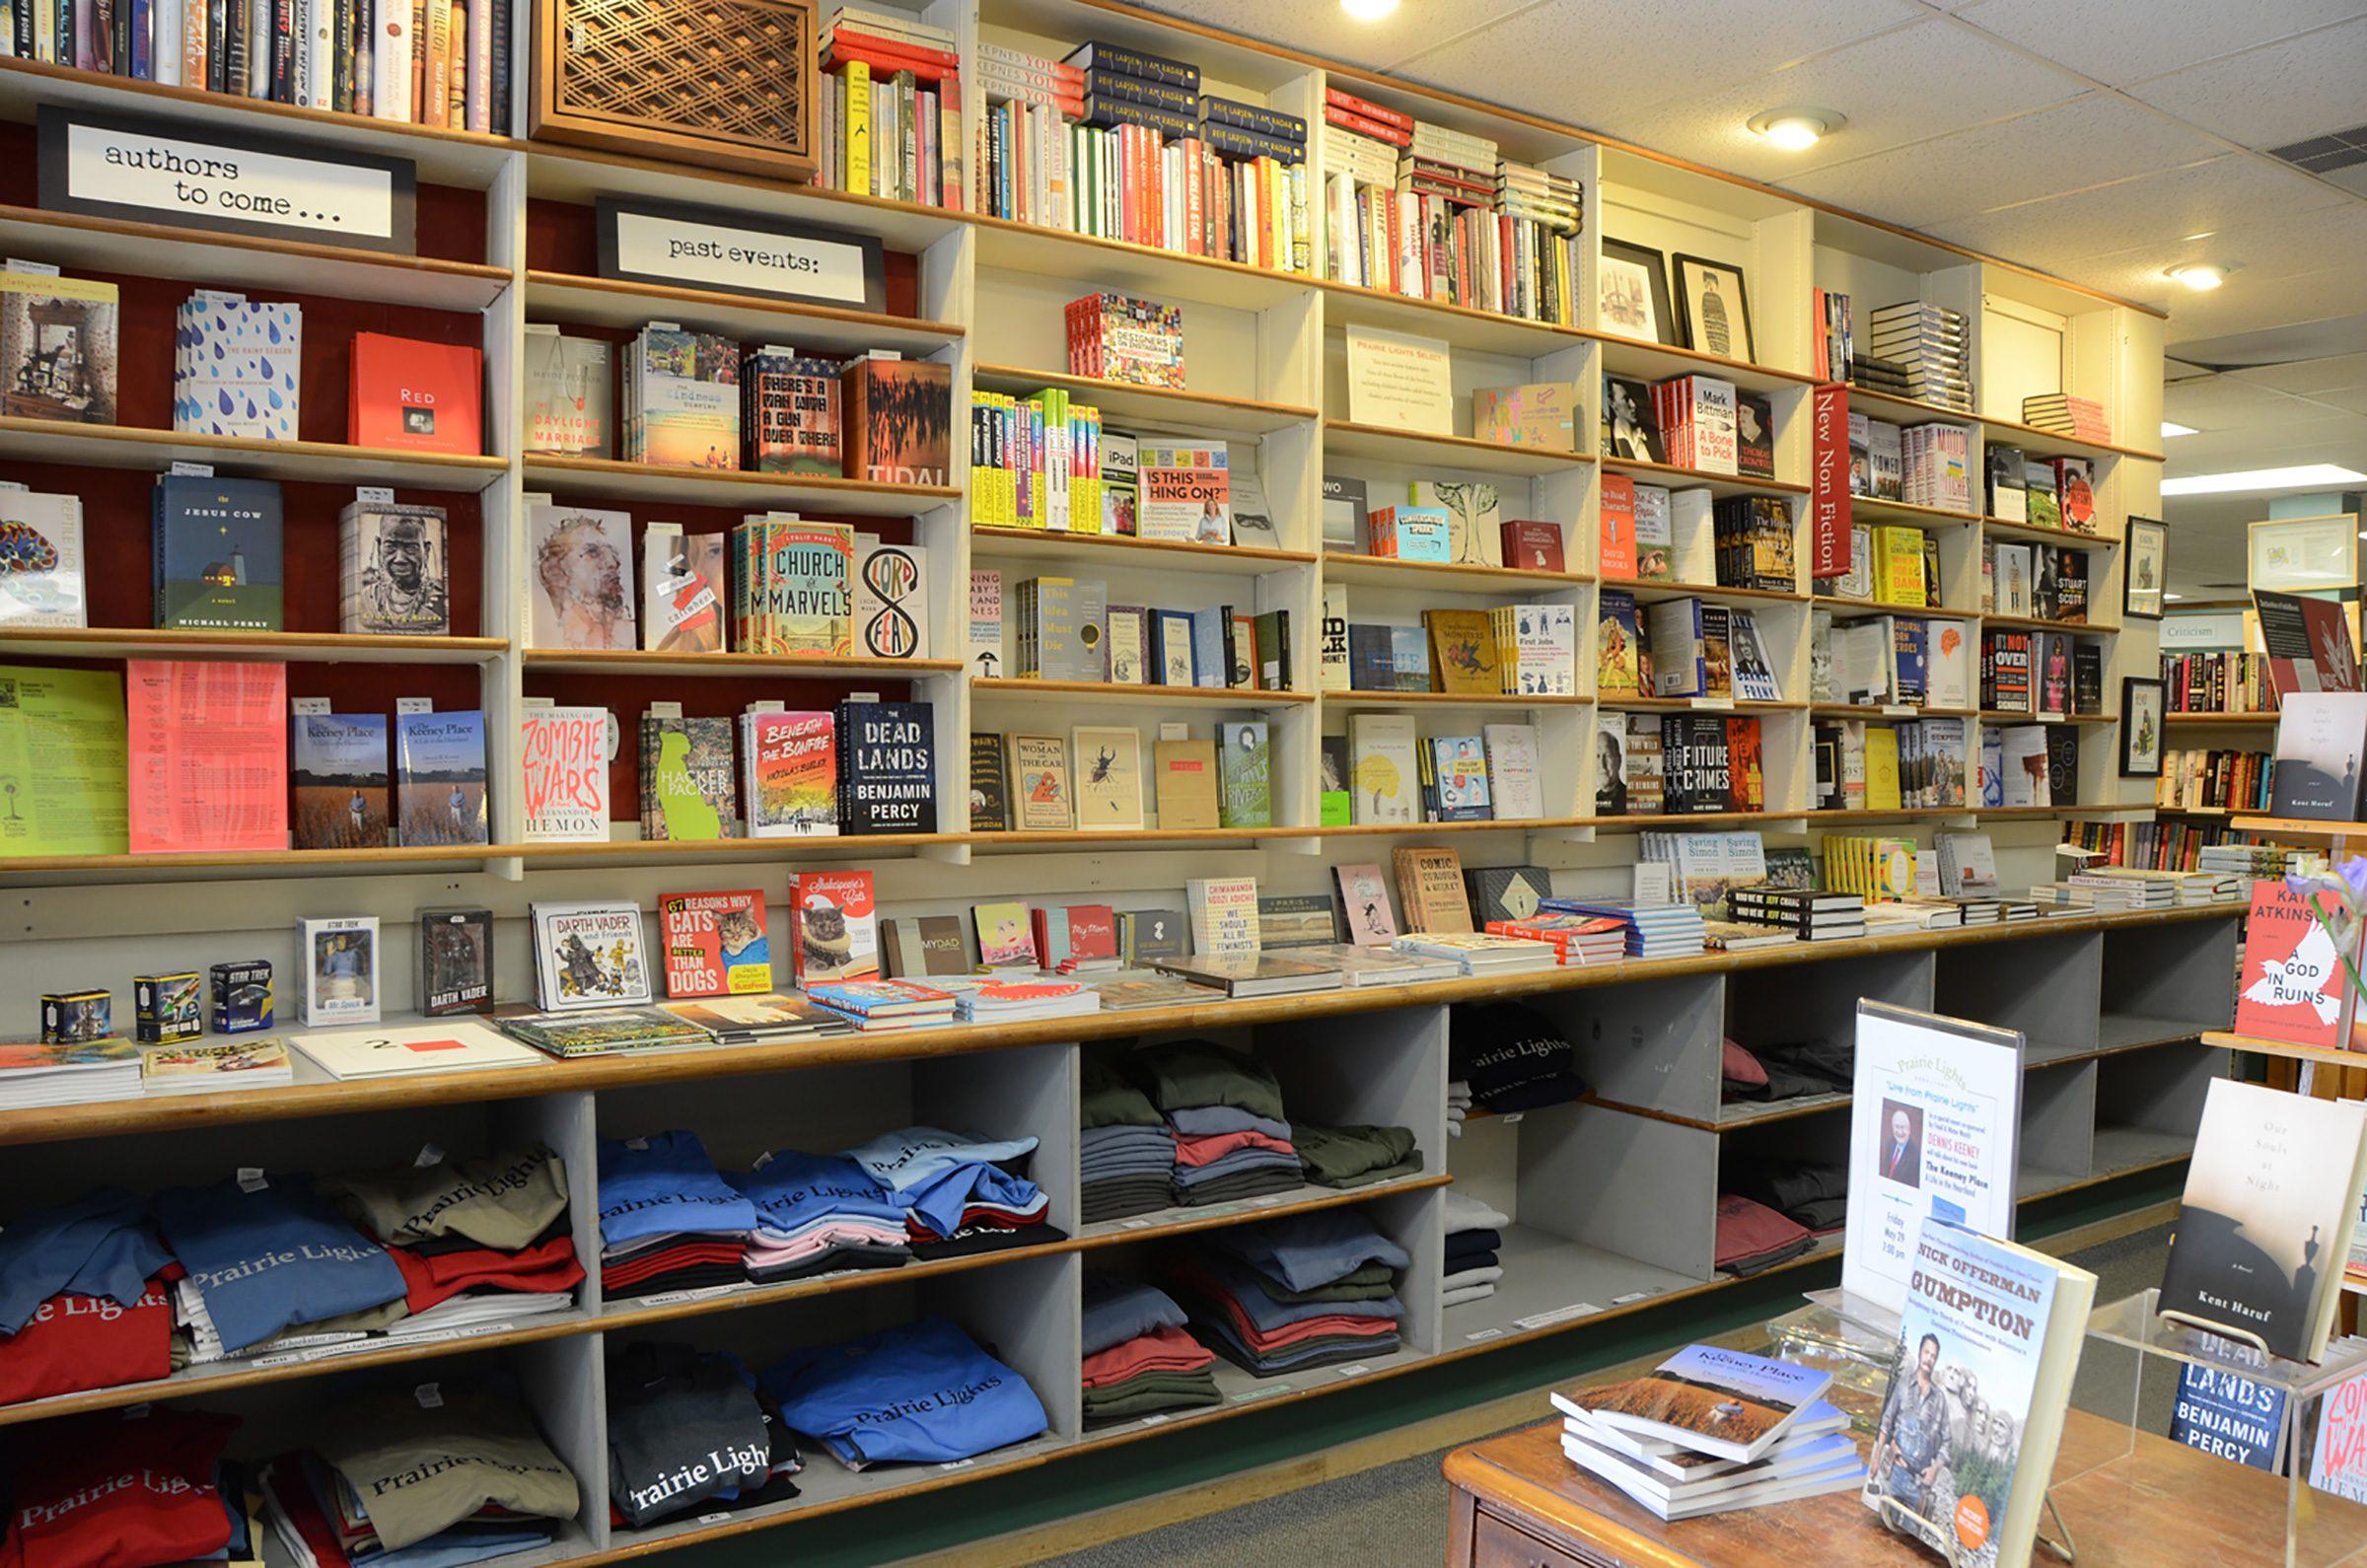 Iowa Prairie Lights books and cafe